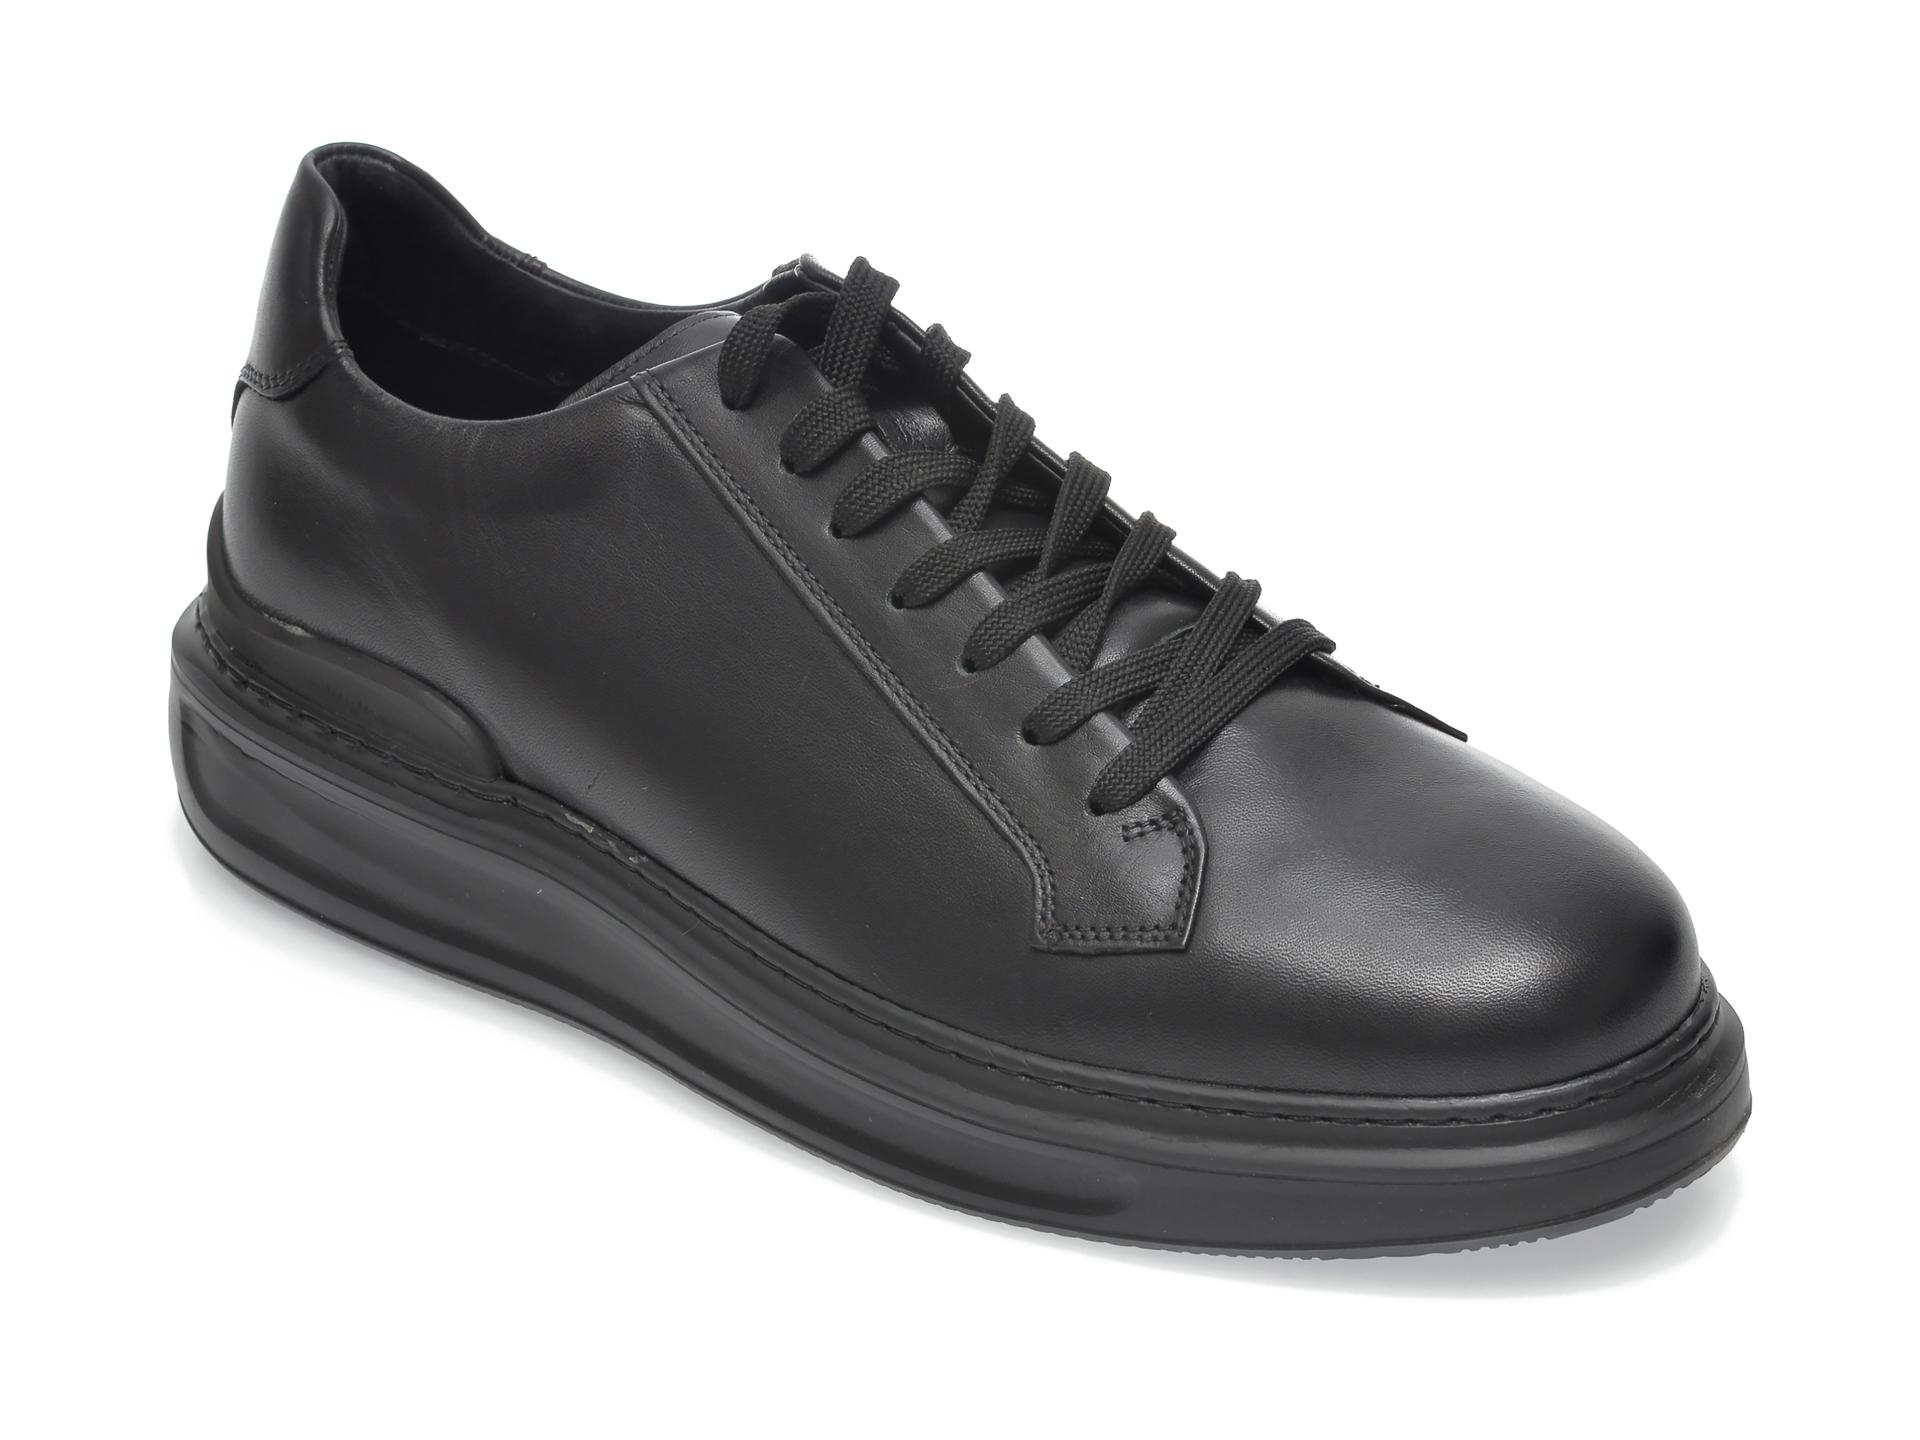 Pantofi OTTER negri, 9155, din piele naturala imagine